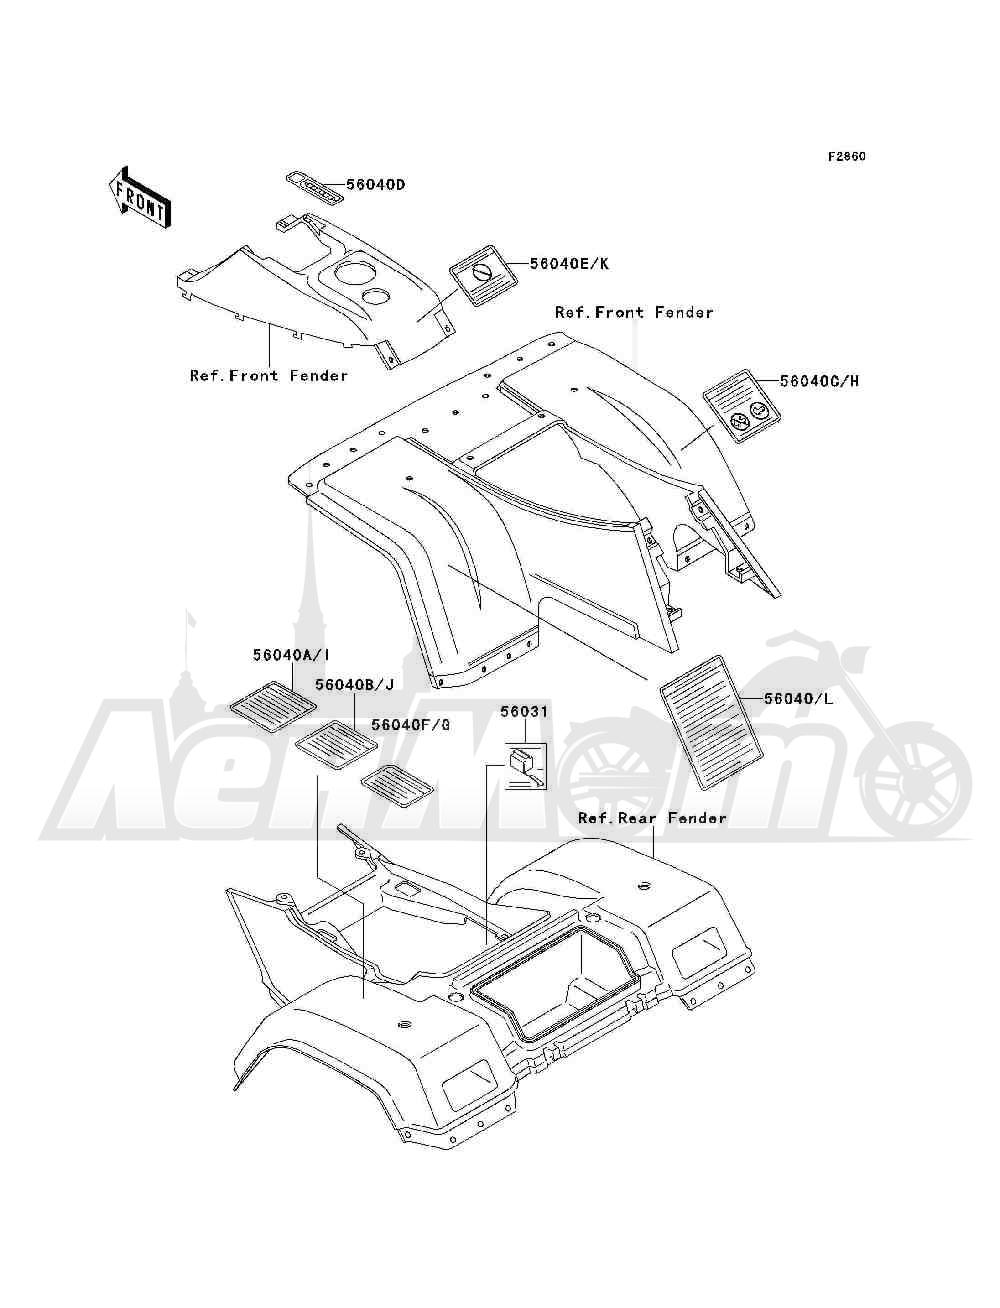 Запчасти для Квадроцикла Kawasaki 1994 BAYOU 300 4X4 (KLF300-C6) Раздел: LABELS | этикетки, метки